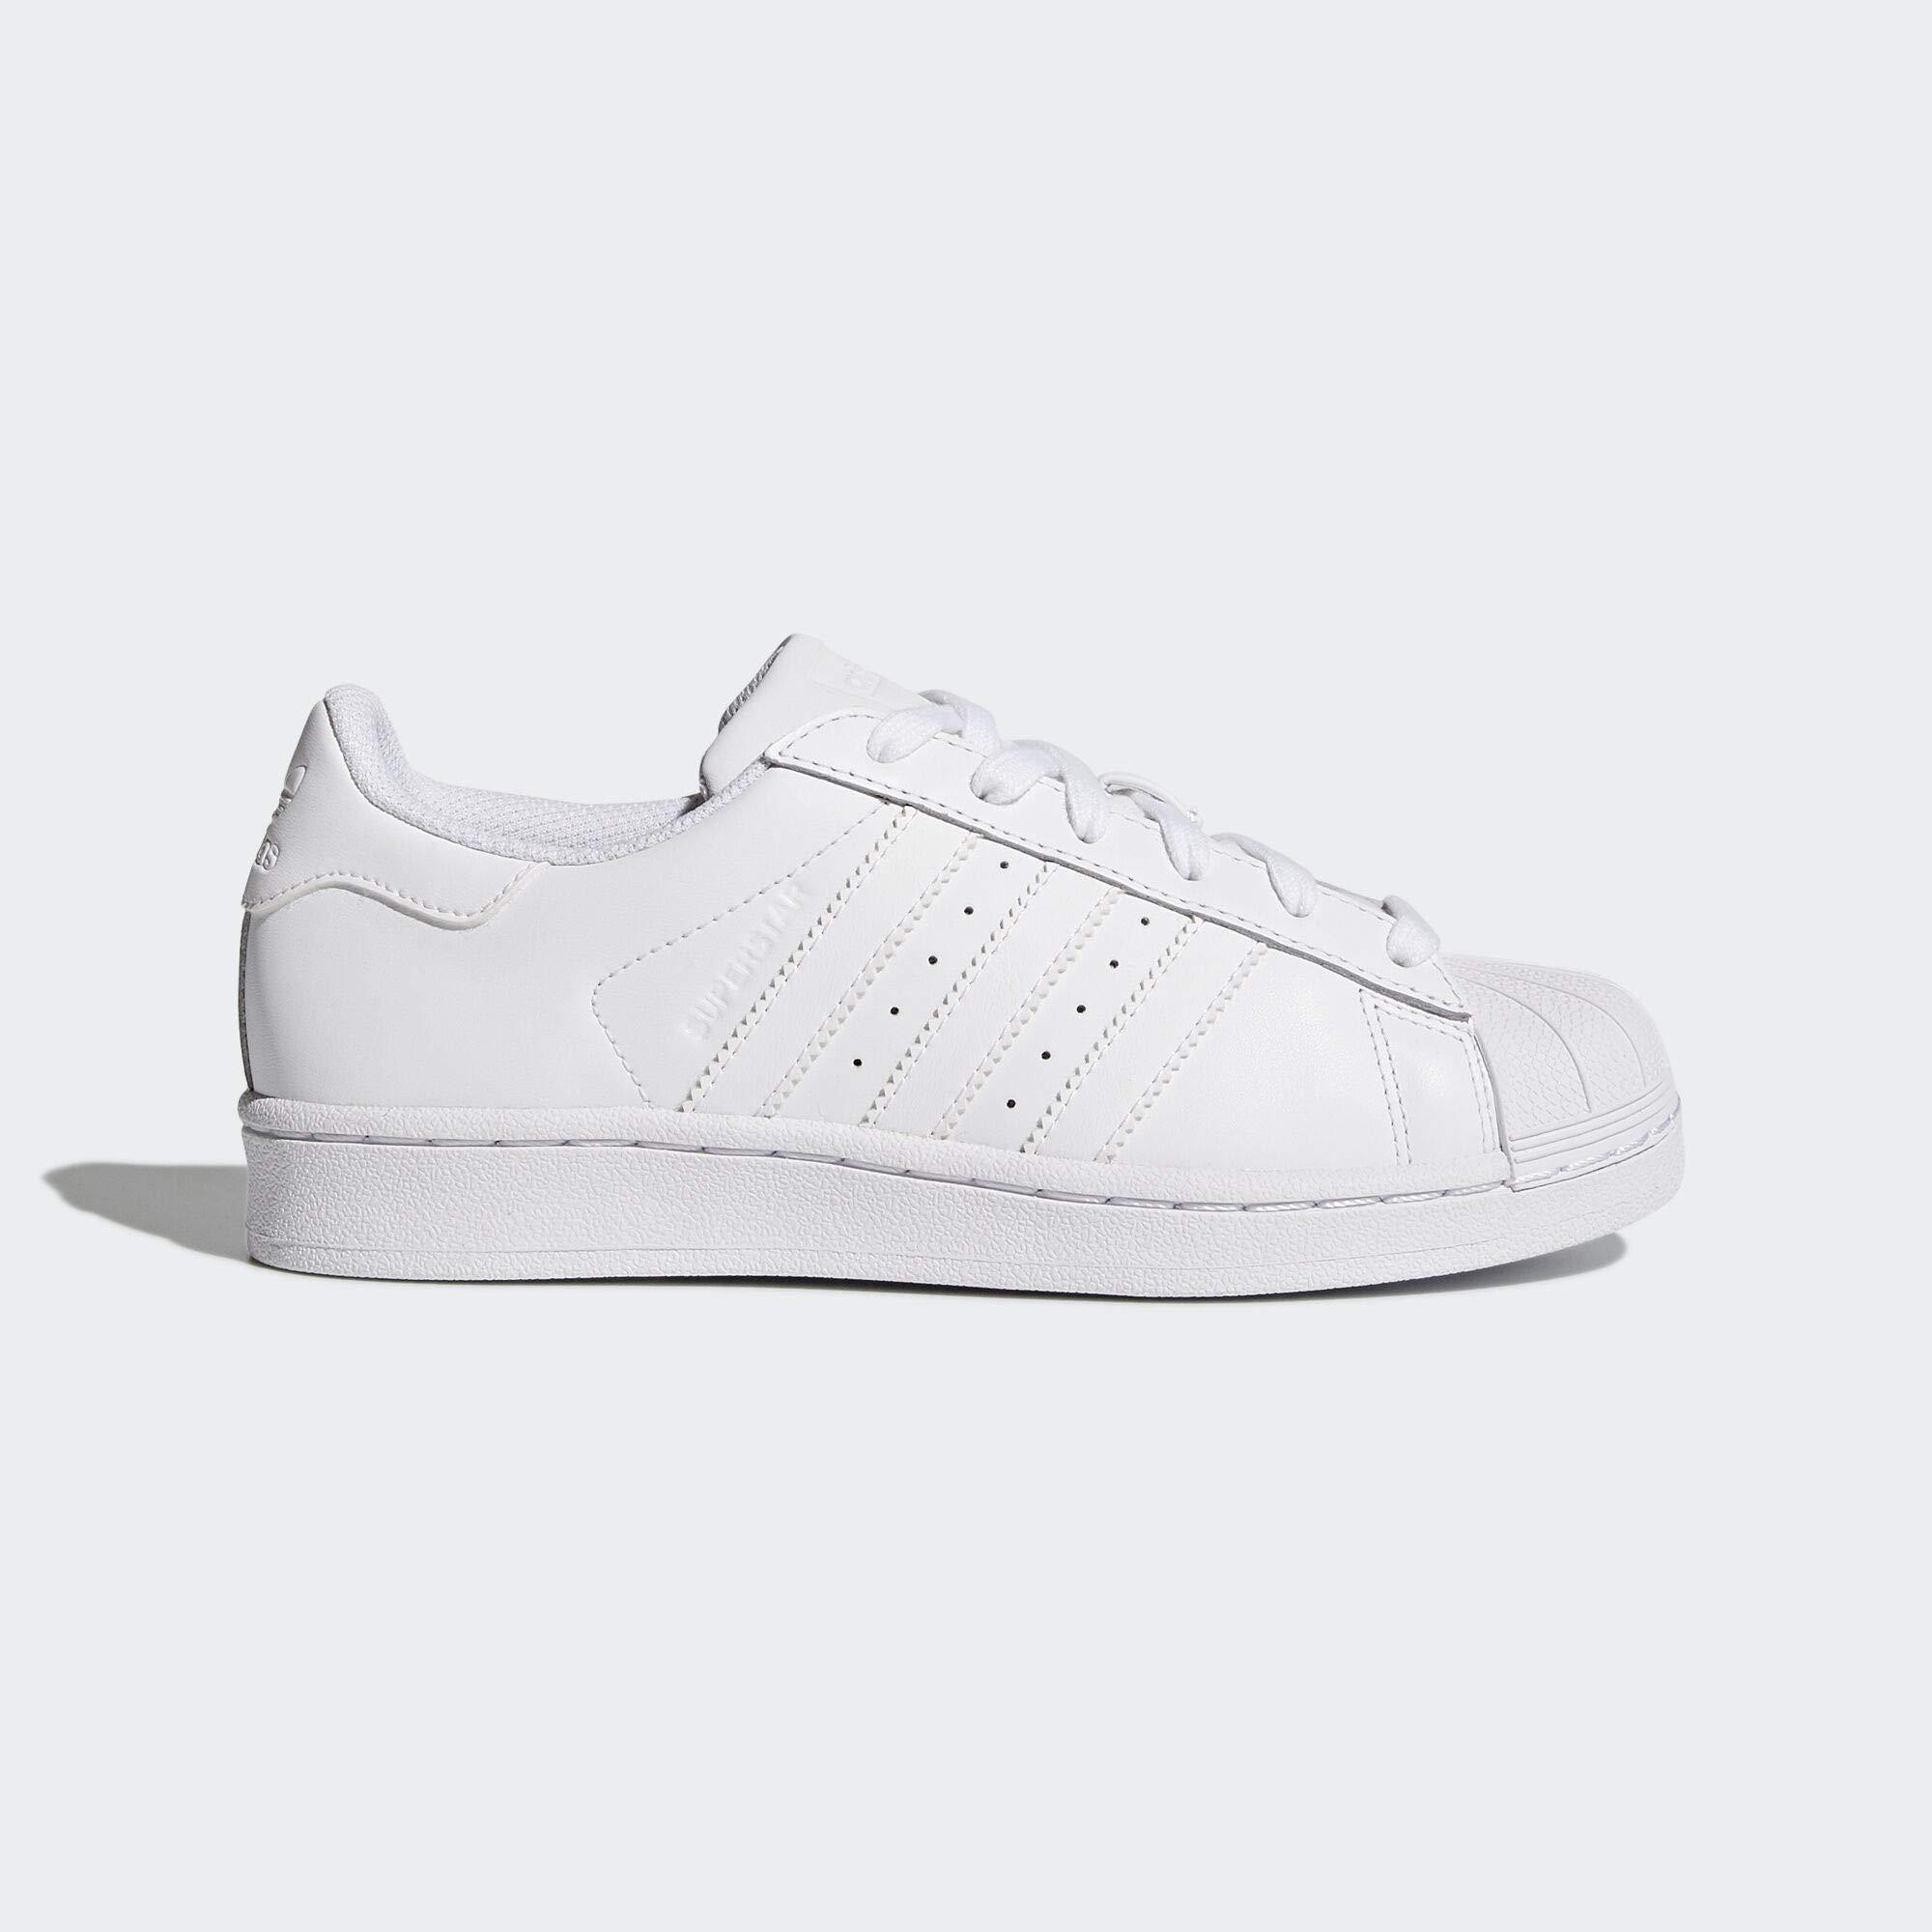 adidas Originals Superstars Running Shoe, Pure White, 4 Big Kid by adidas Originals